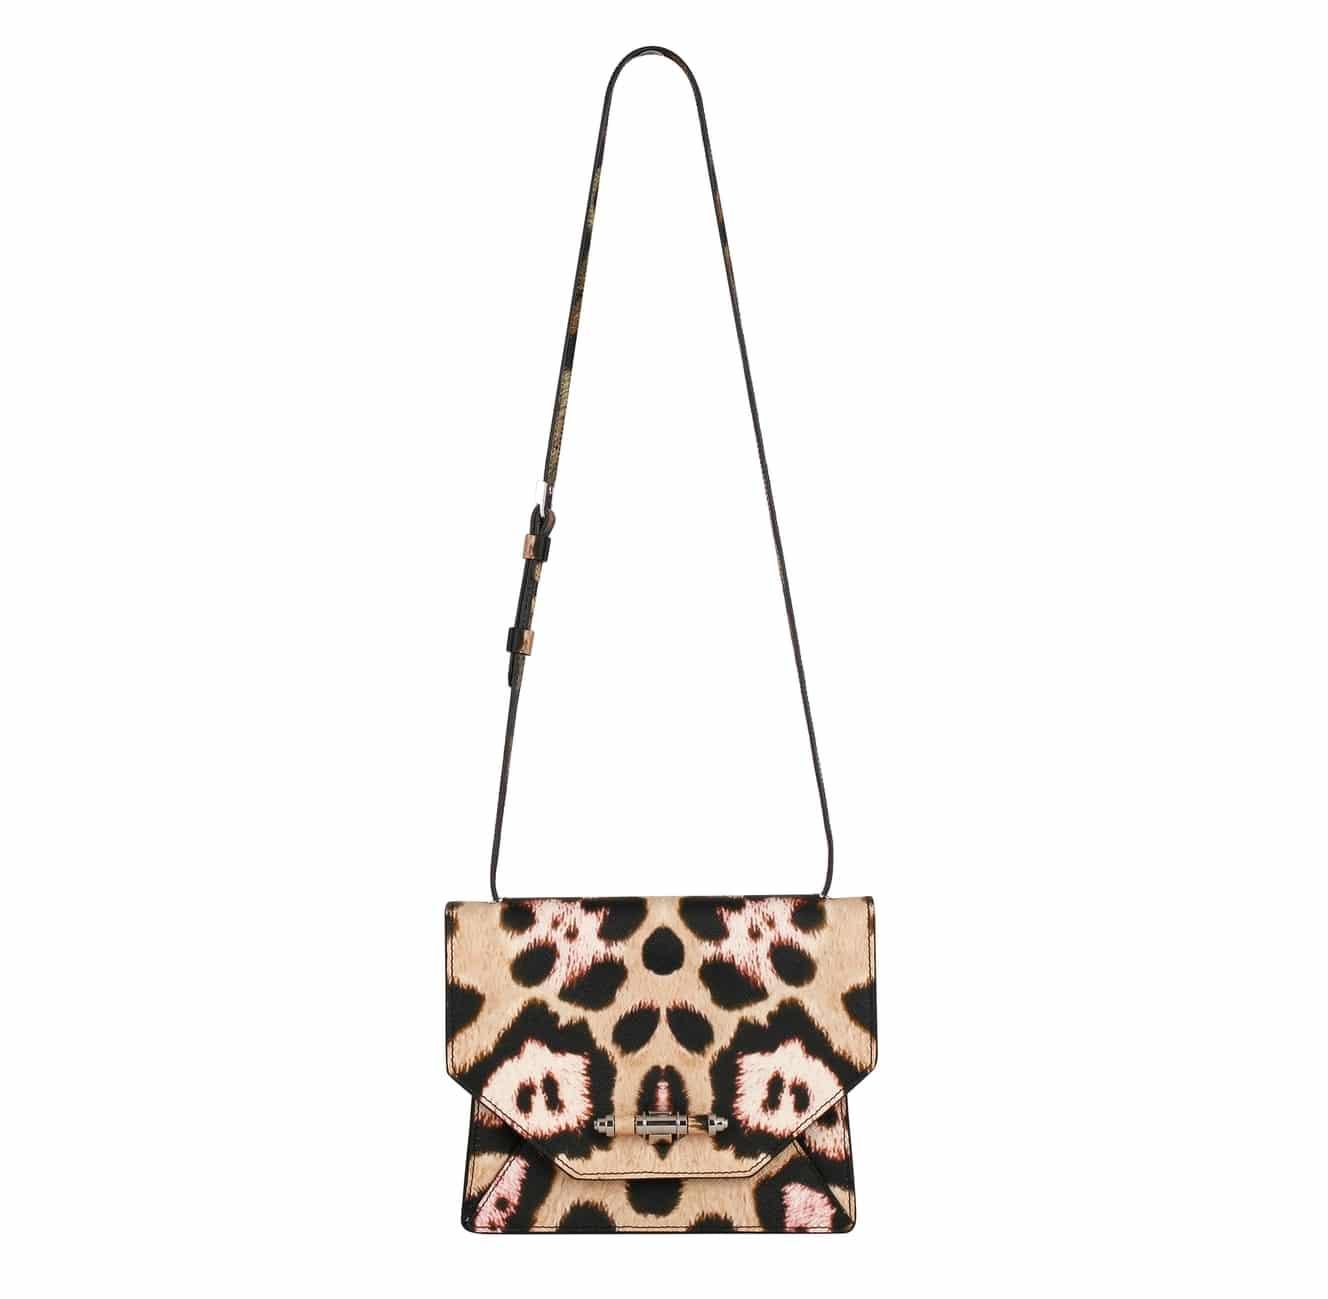 jaguar red handtasche bag printed designers black handbags givenchy luxury antigona large shopping